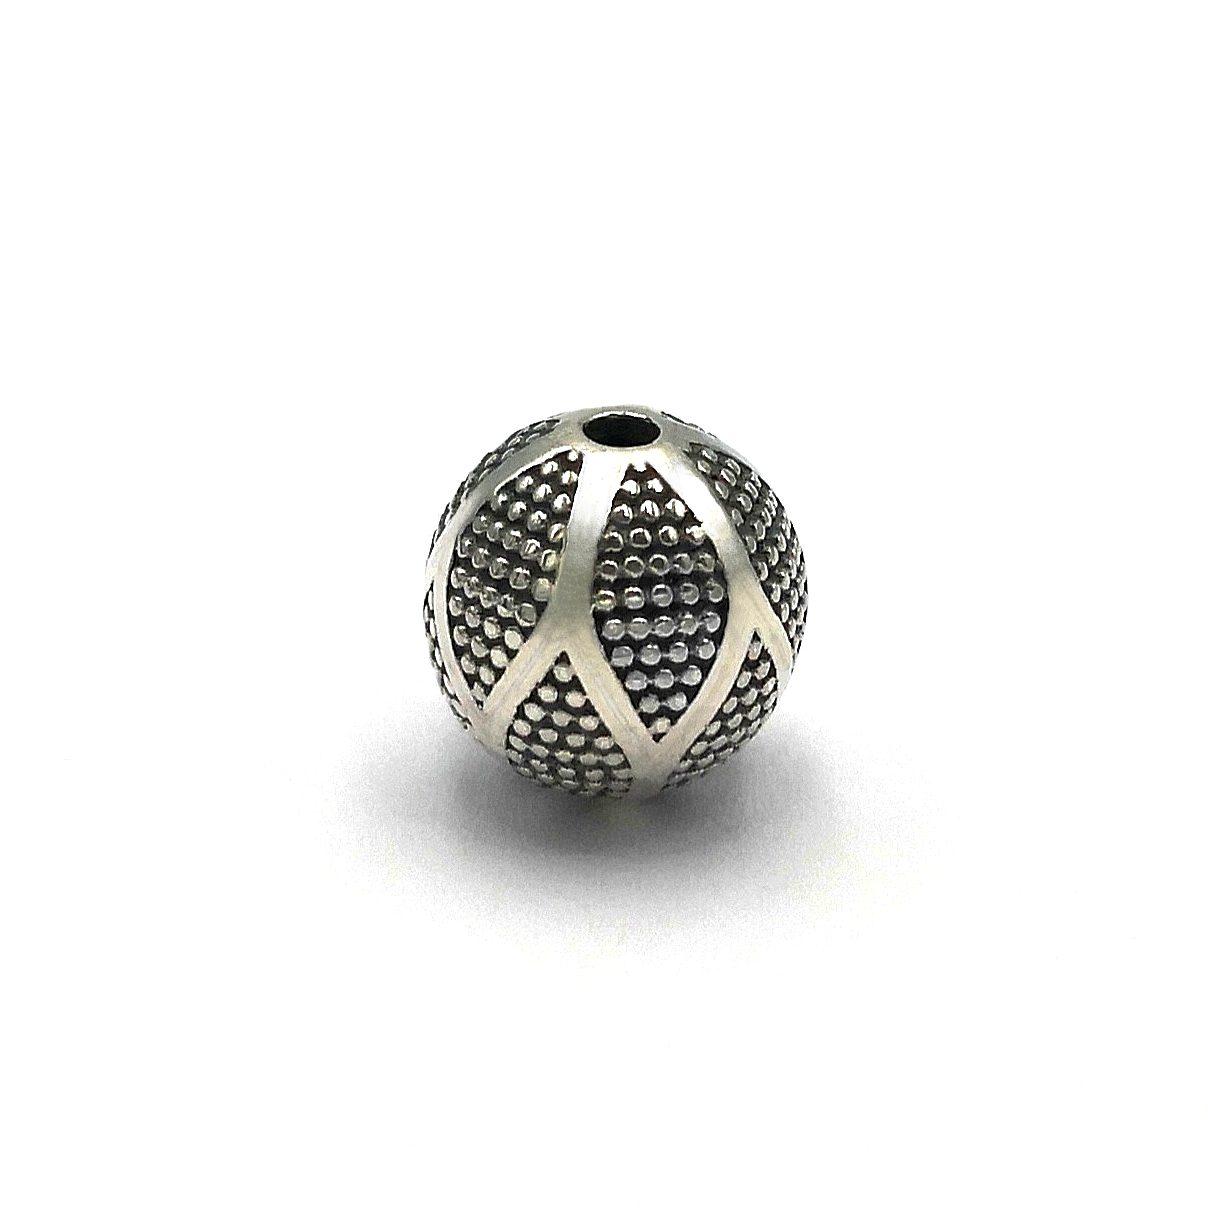 12 mm 925 Sterling Silver Bali Bead